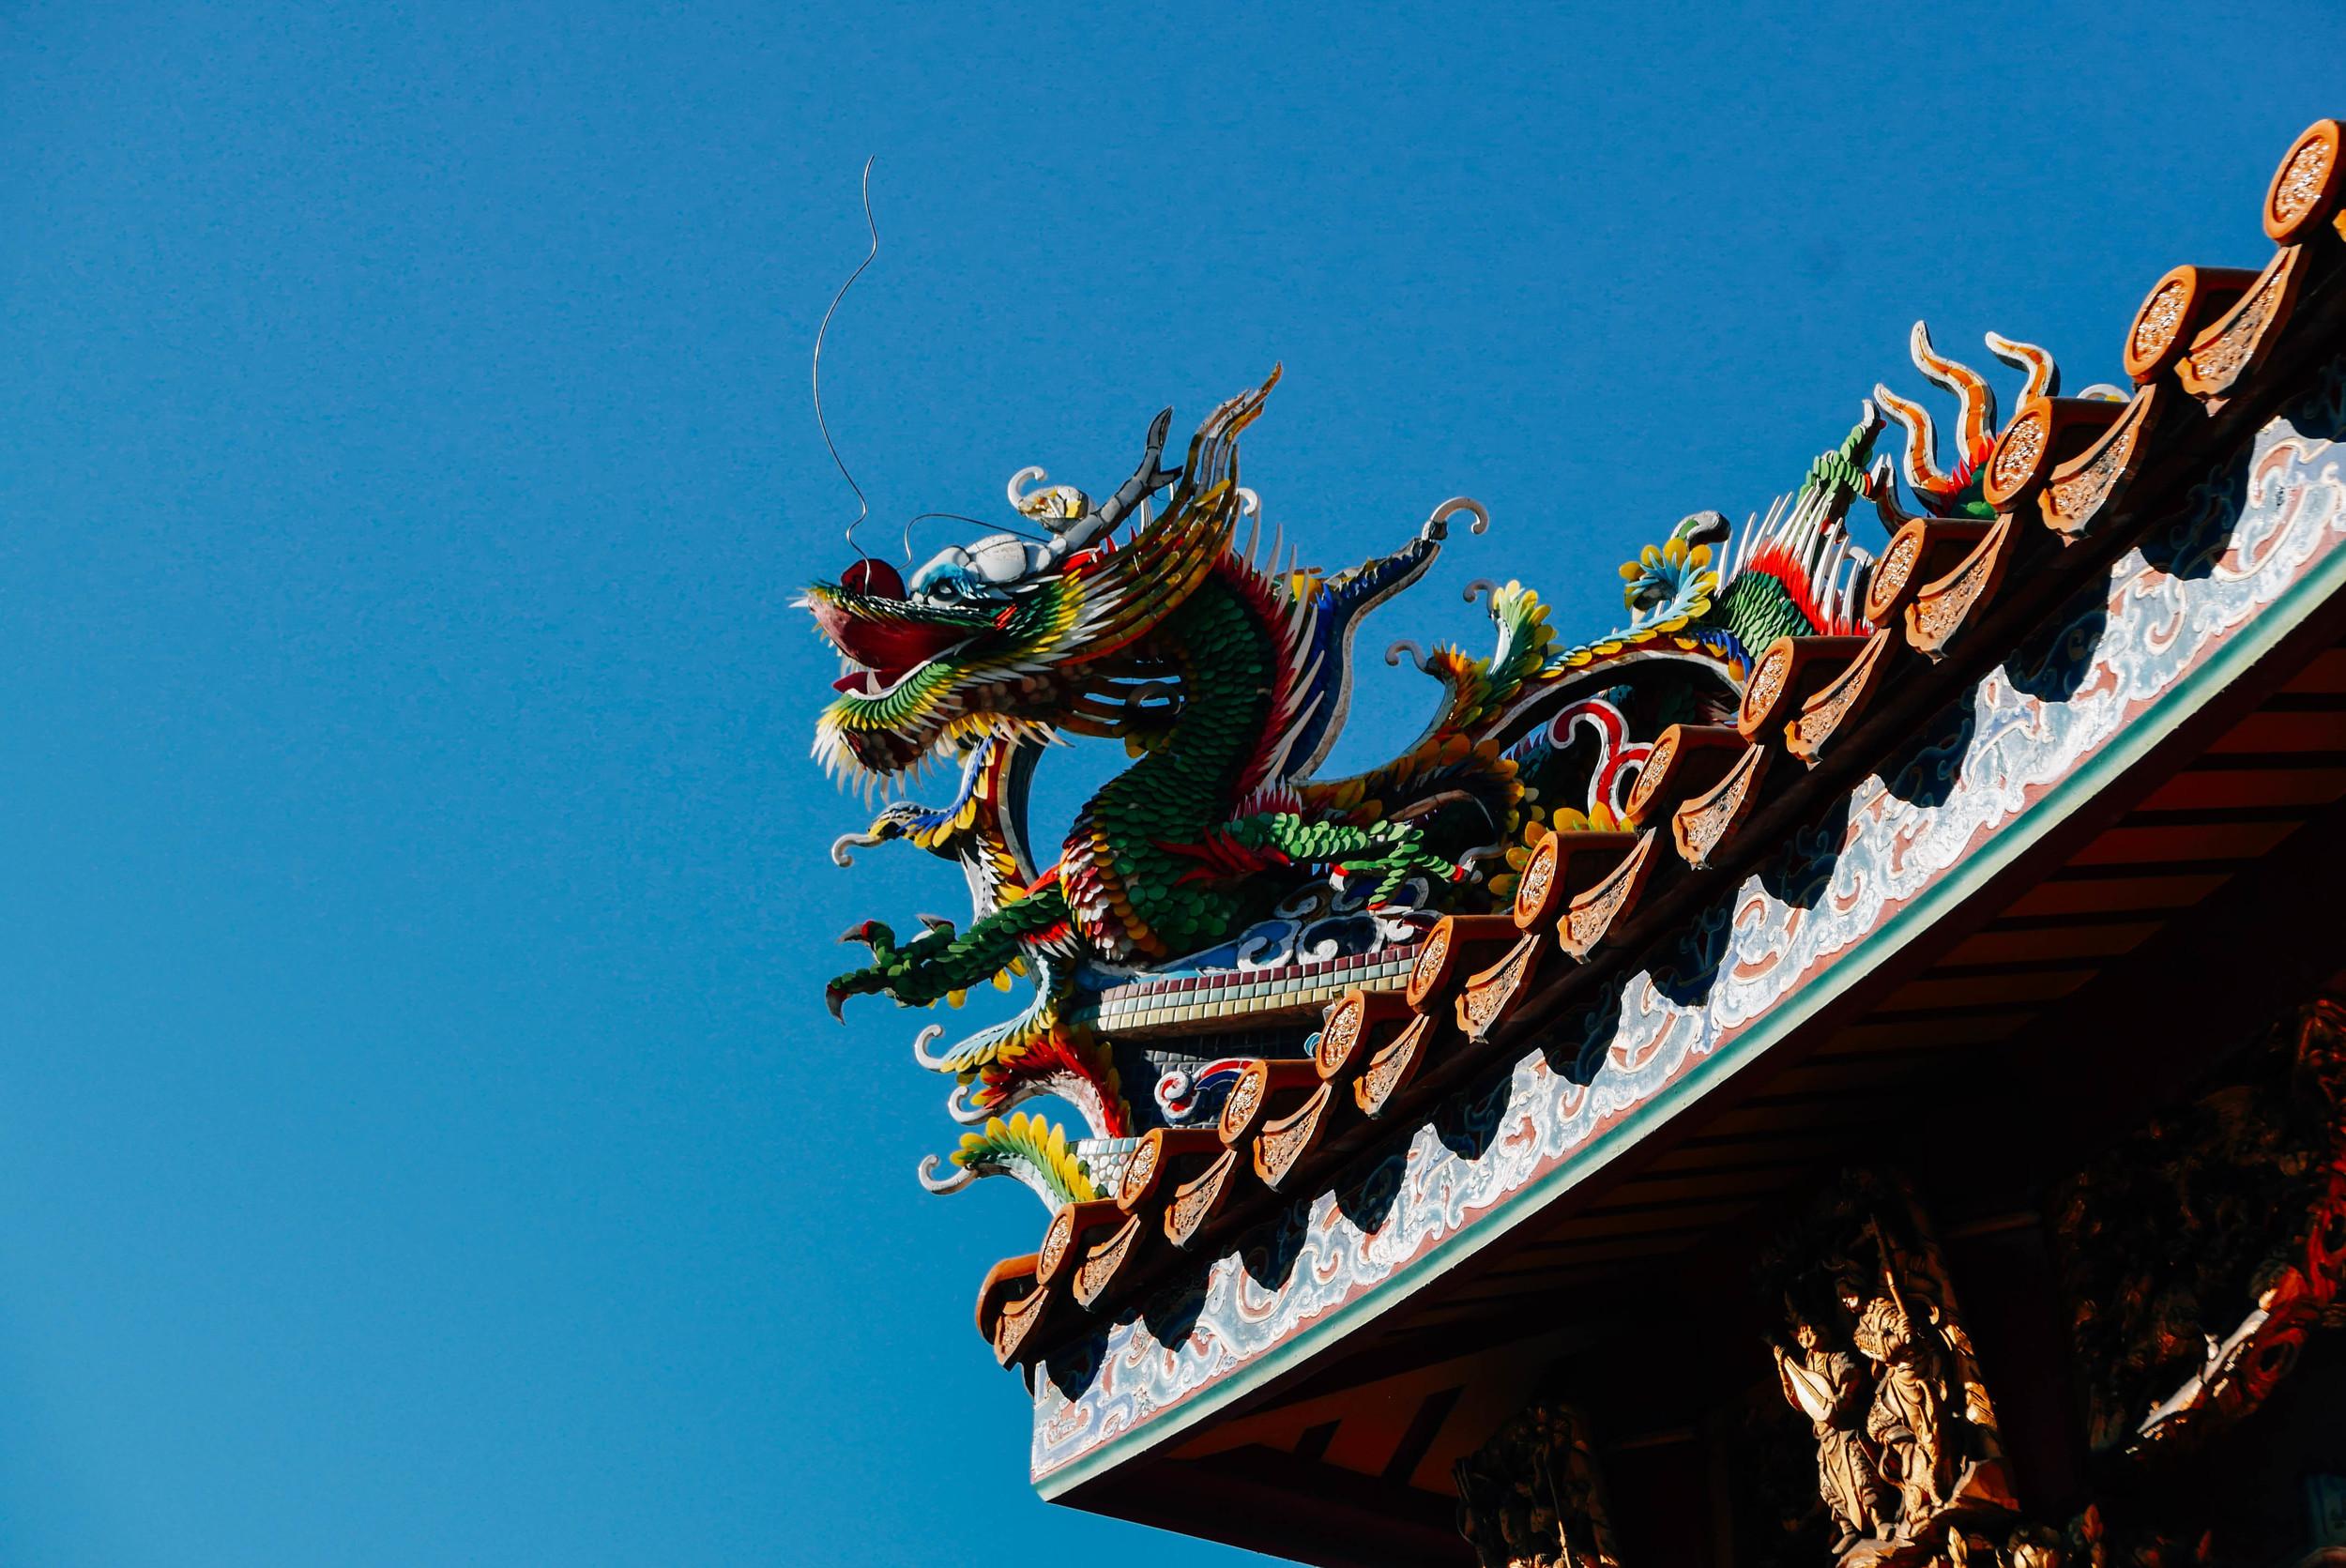 Glass dragon adorning the roof of Kanteibyo.